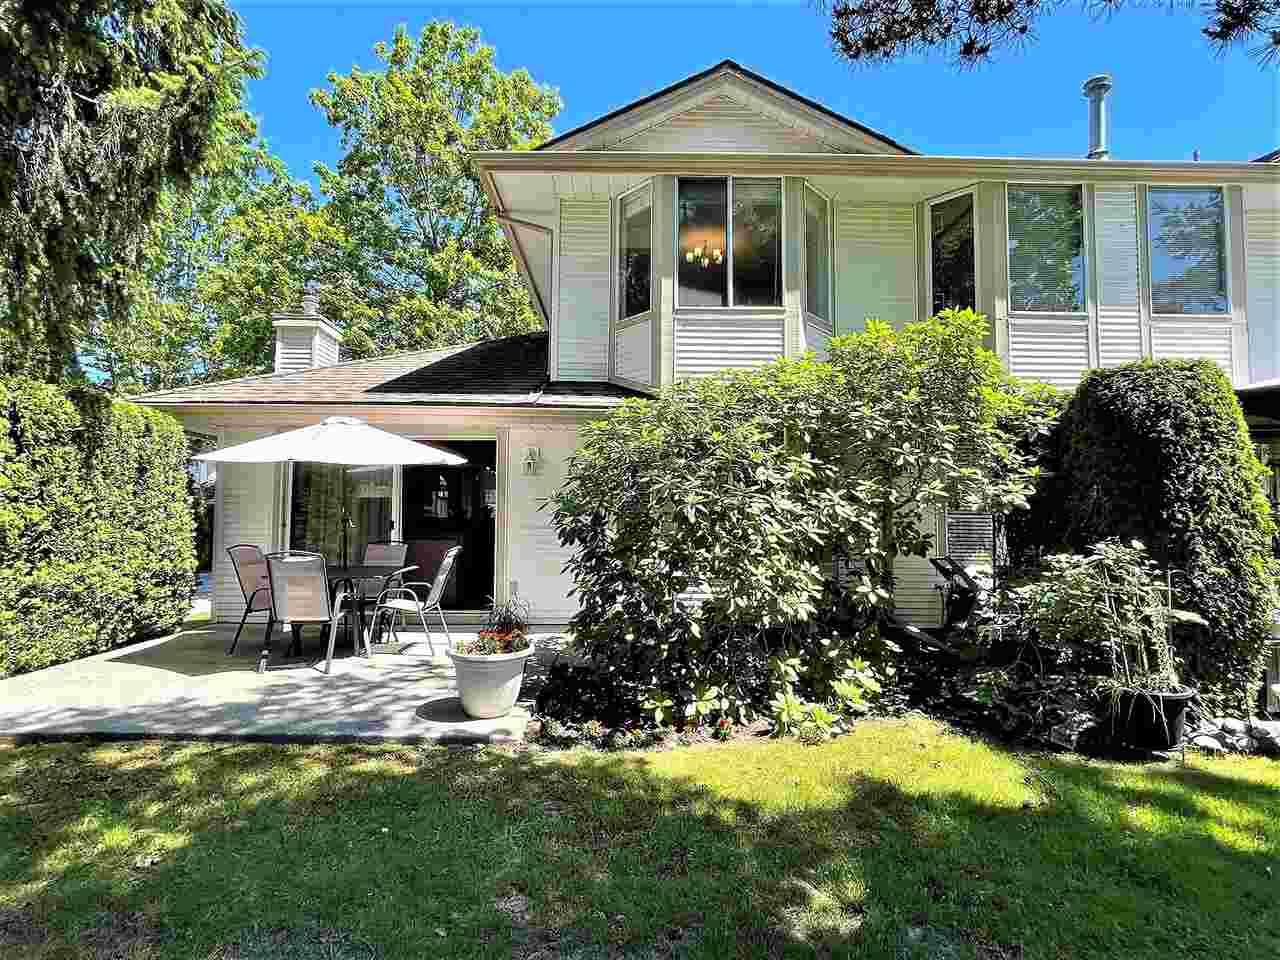 104 9045 WALNUT GROVE DRIVE - Walnut Grove Townhouse for sale, 3 Bedrooms (R2588351) #38